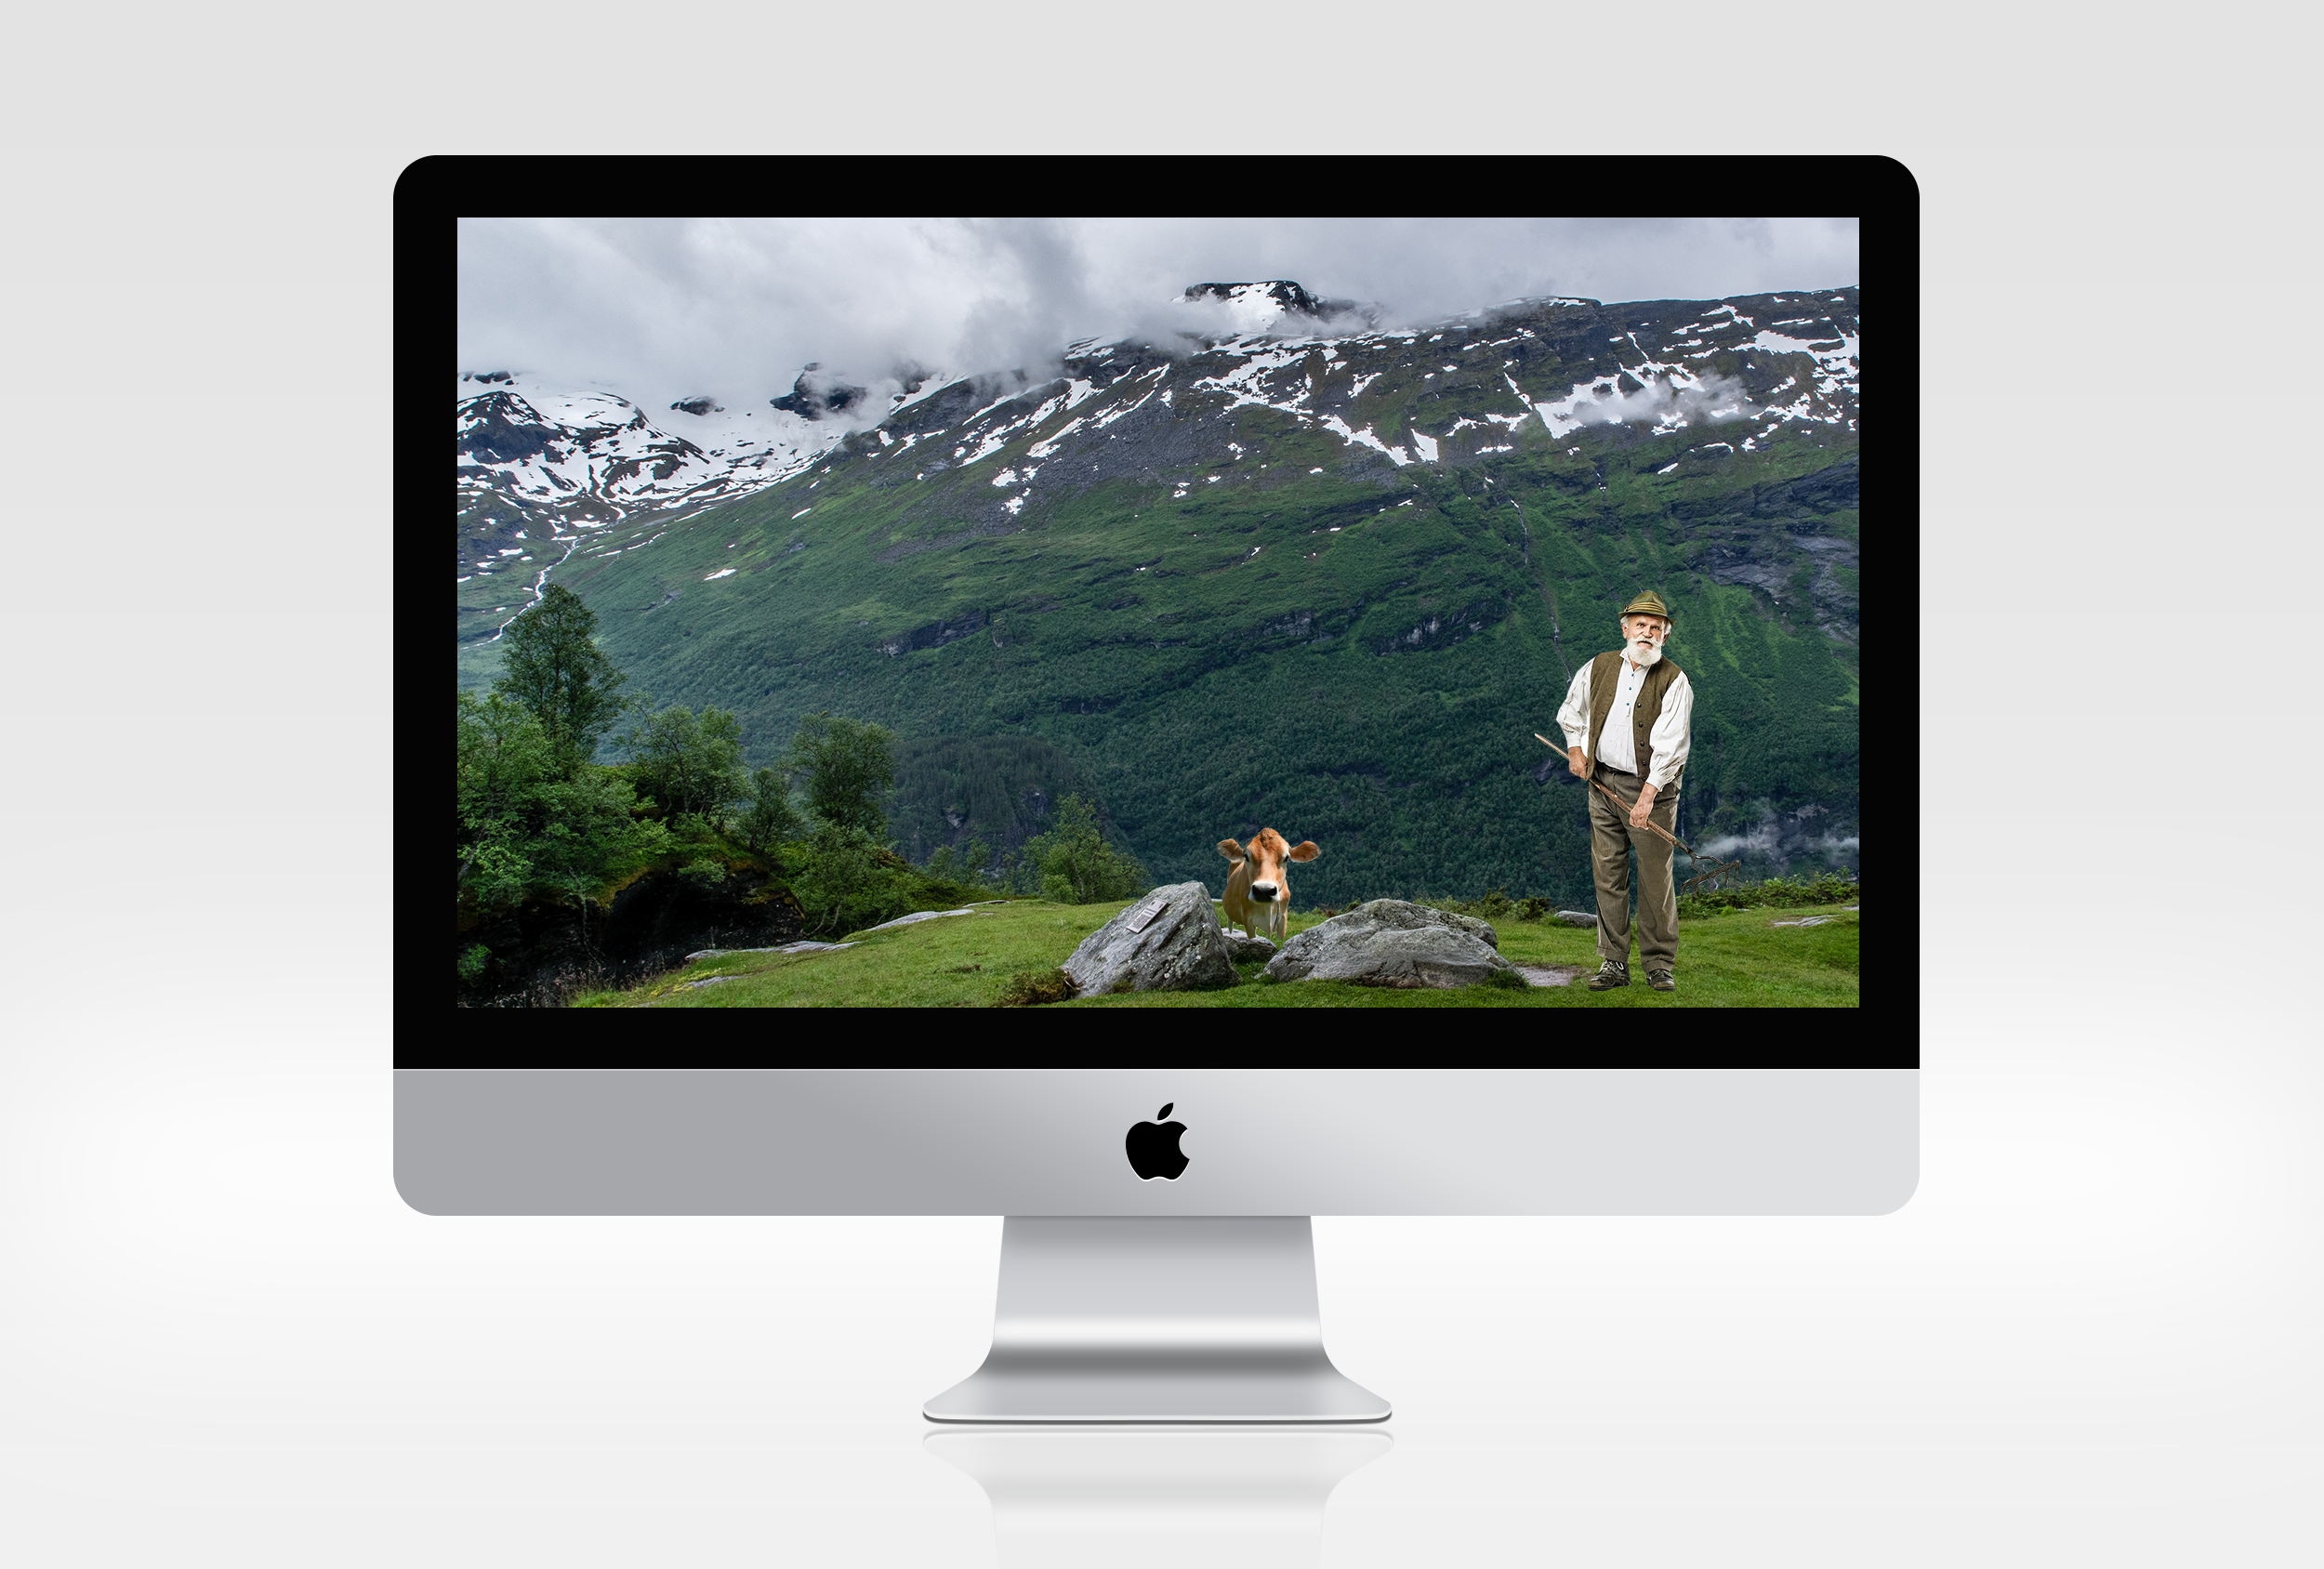 iMac-psd-mockup-template-10.png